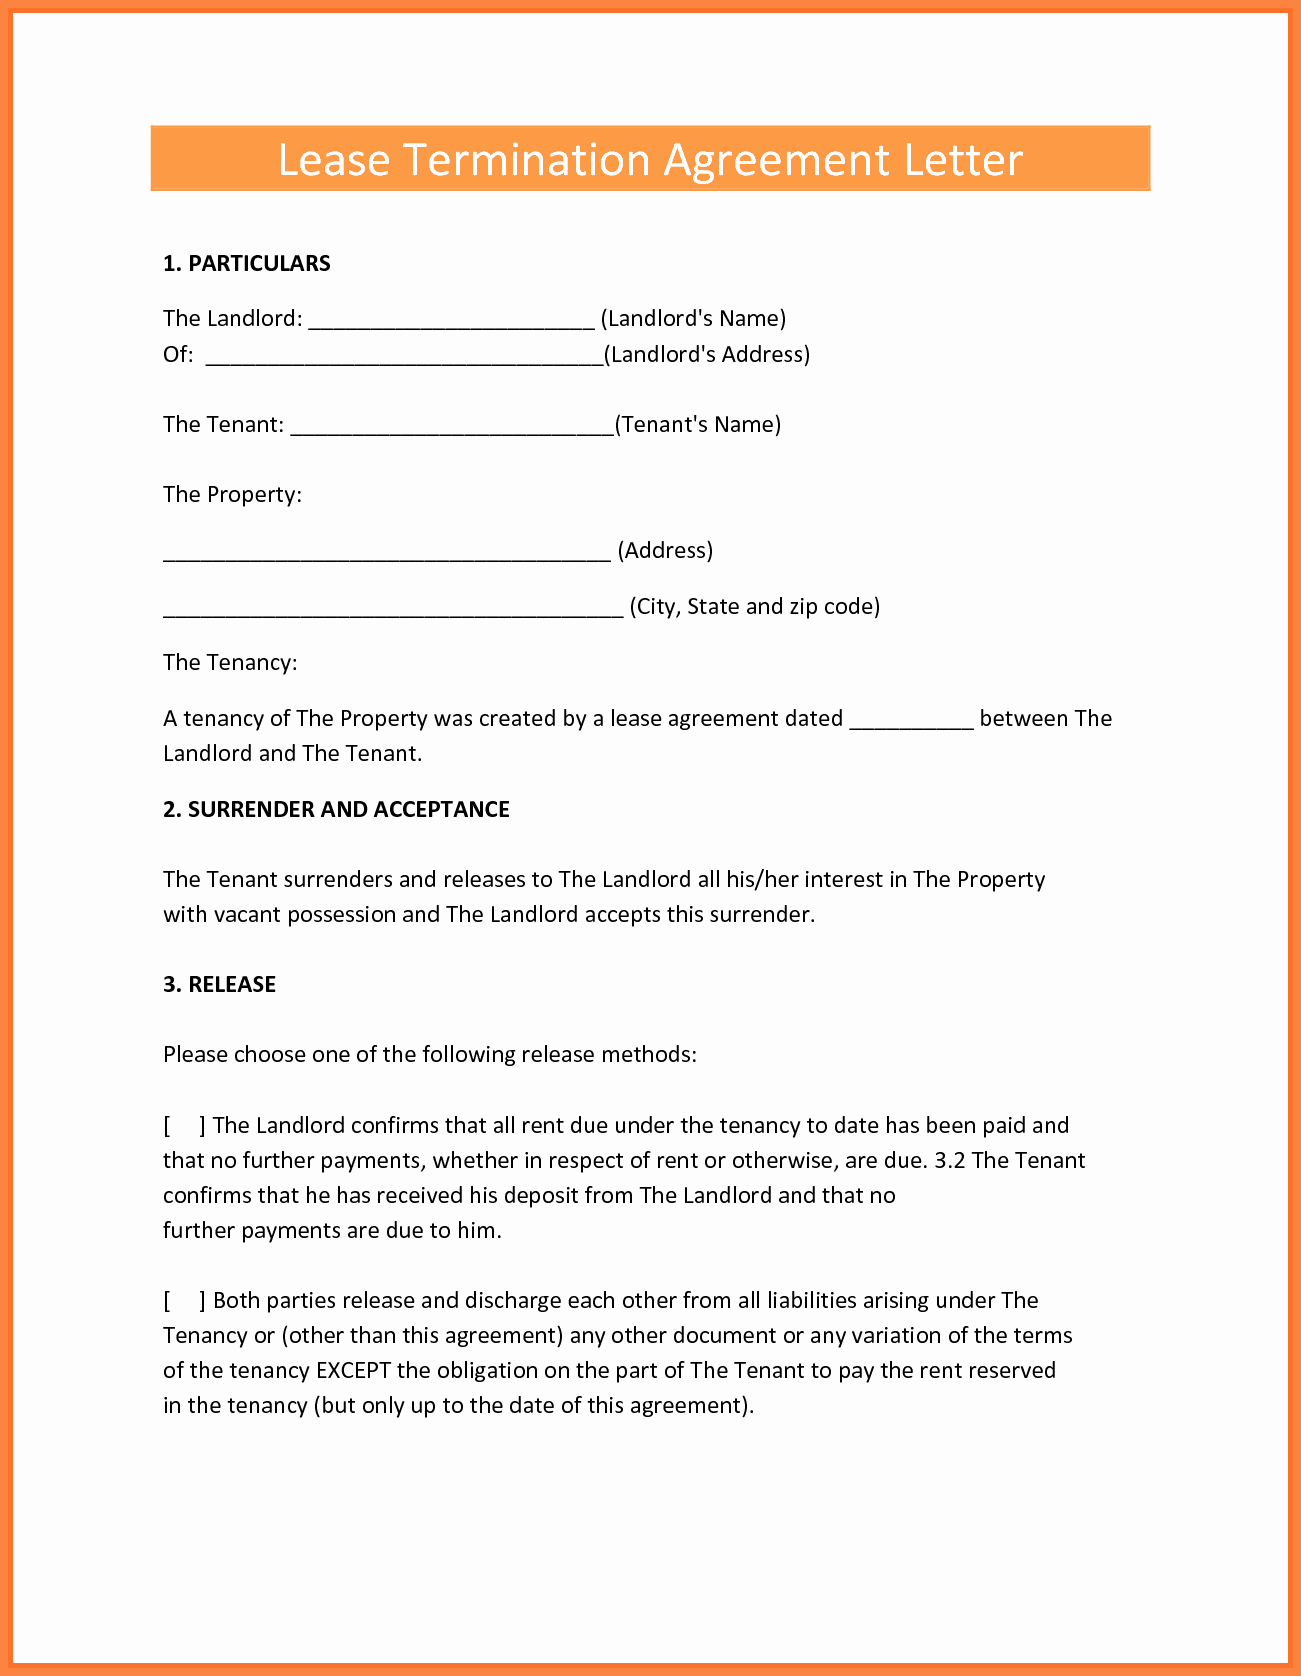 Rental Agreement Termination Letter Best Of 8 Termination Of Rental Agreement Letter by Tenant